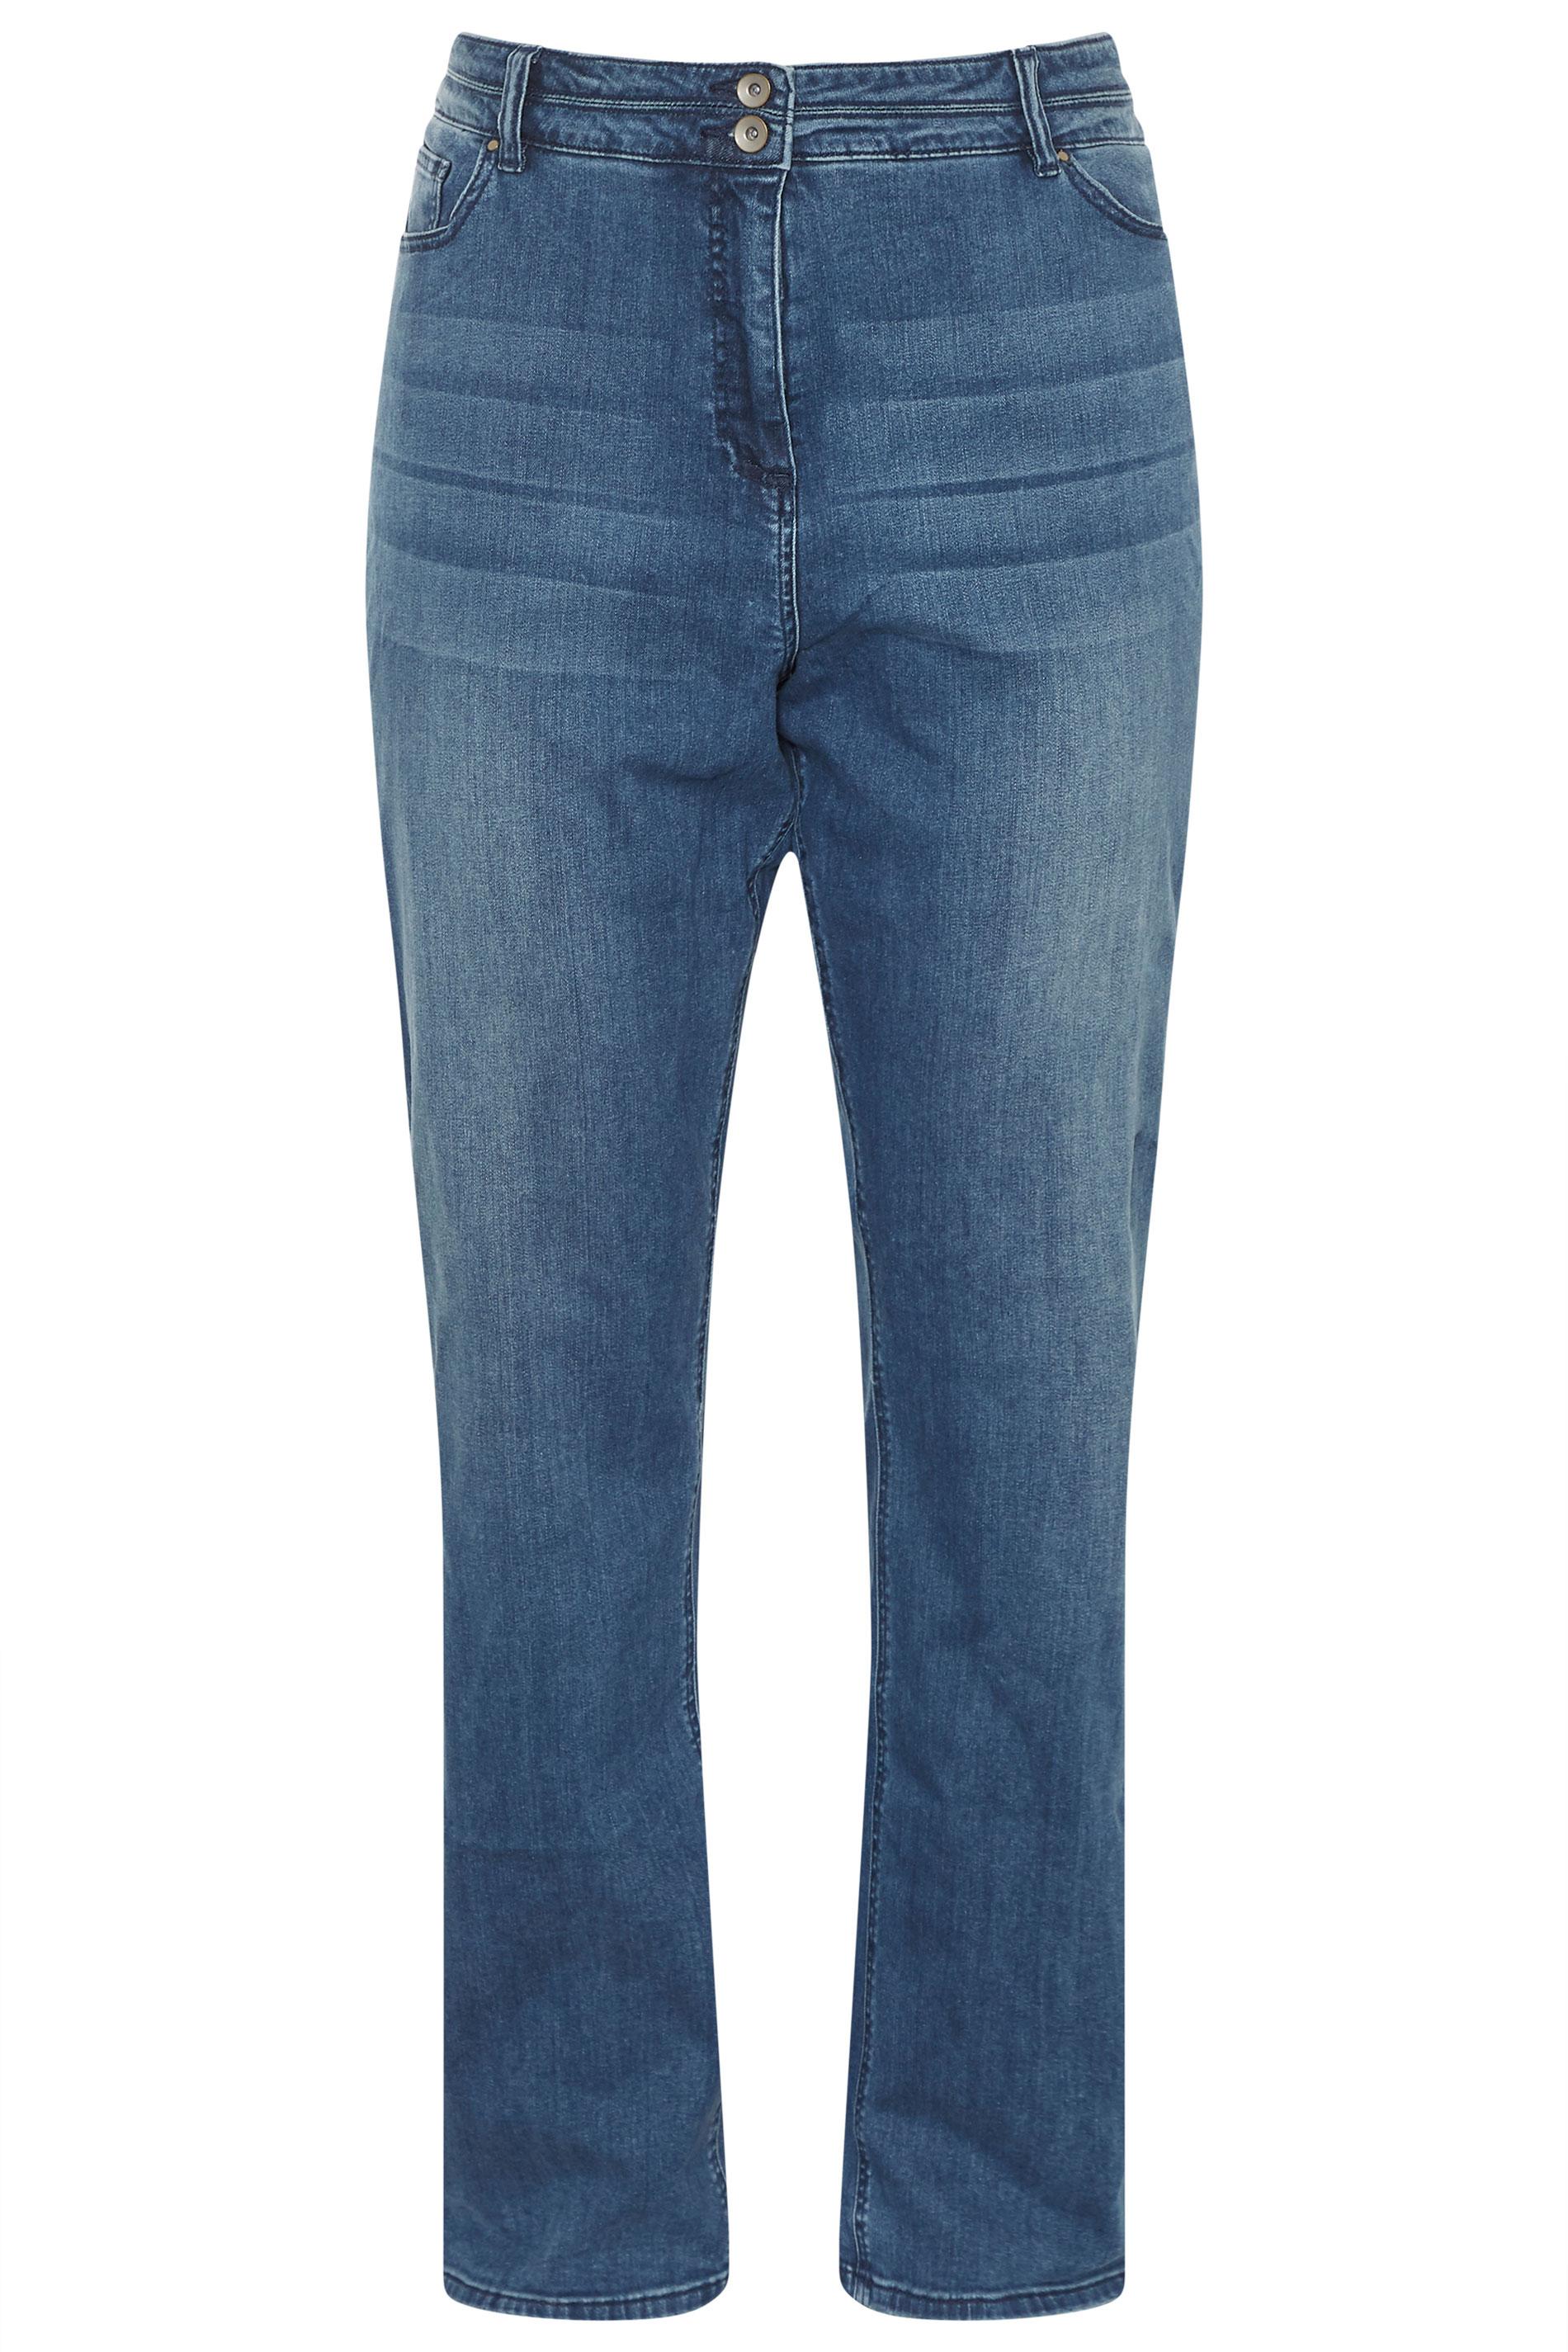 Blue Sculpt High Rise Straight Cut Jeans